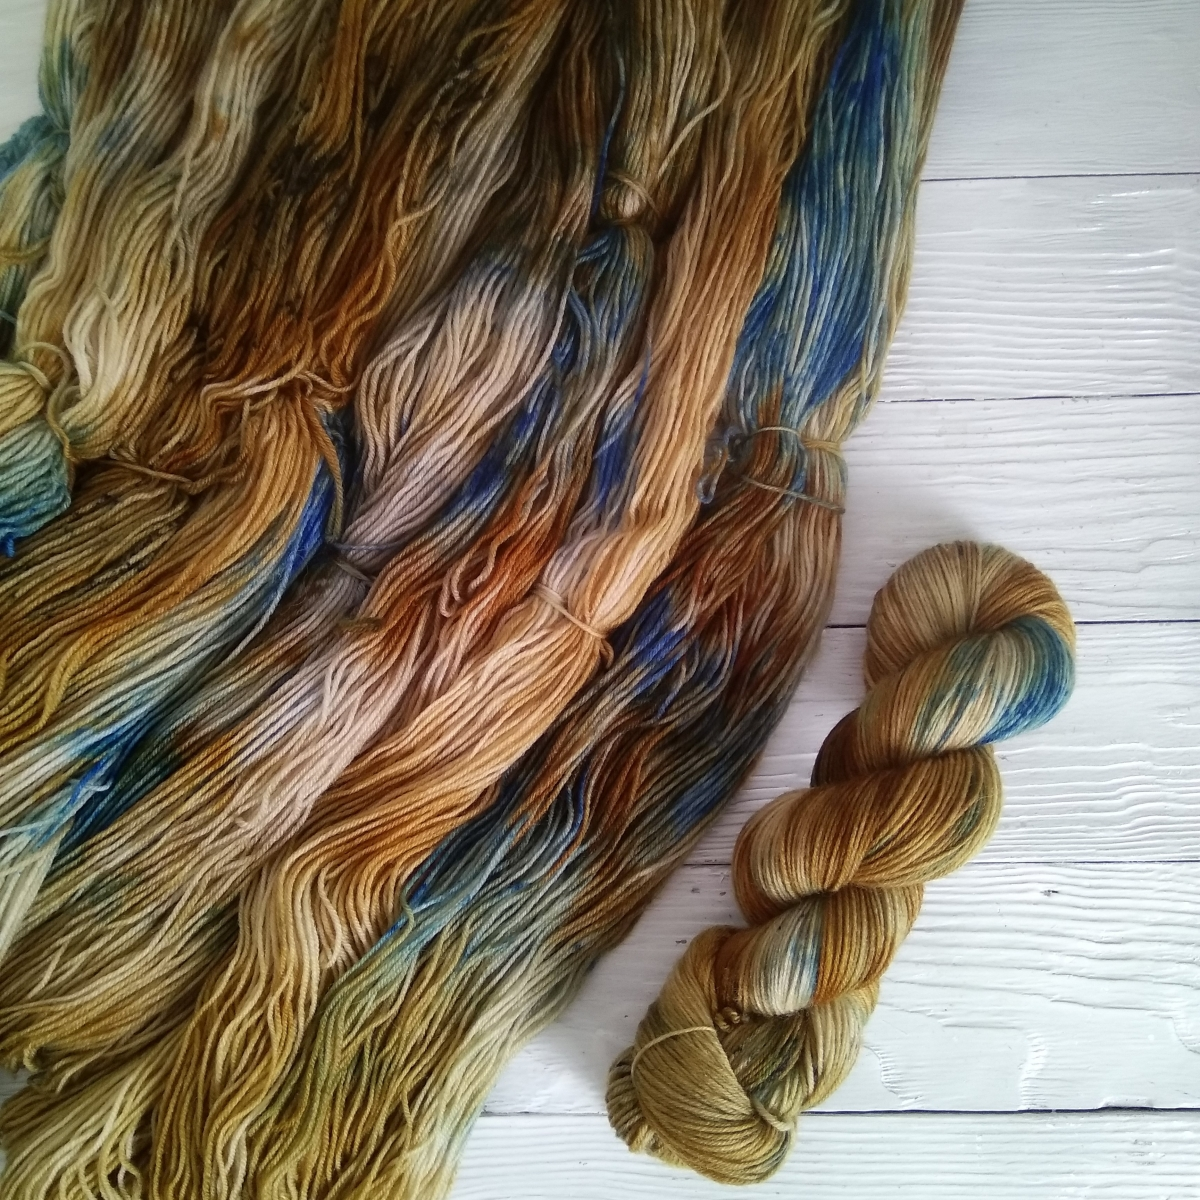 woodico.pro hand dyed yarn 036 1 1200x1200 - Hand dyed yarn / 036